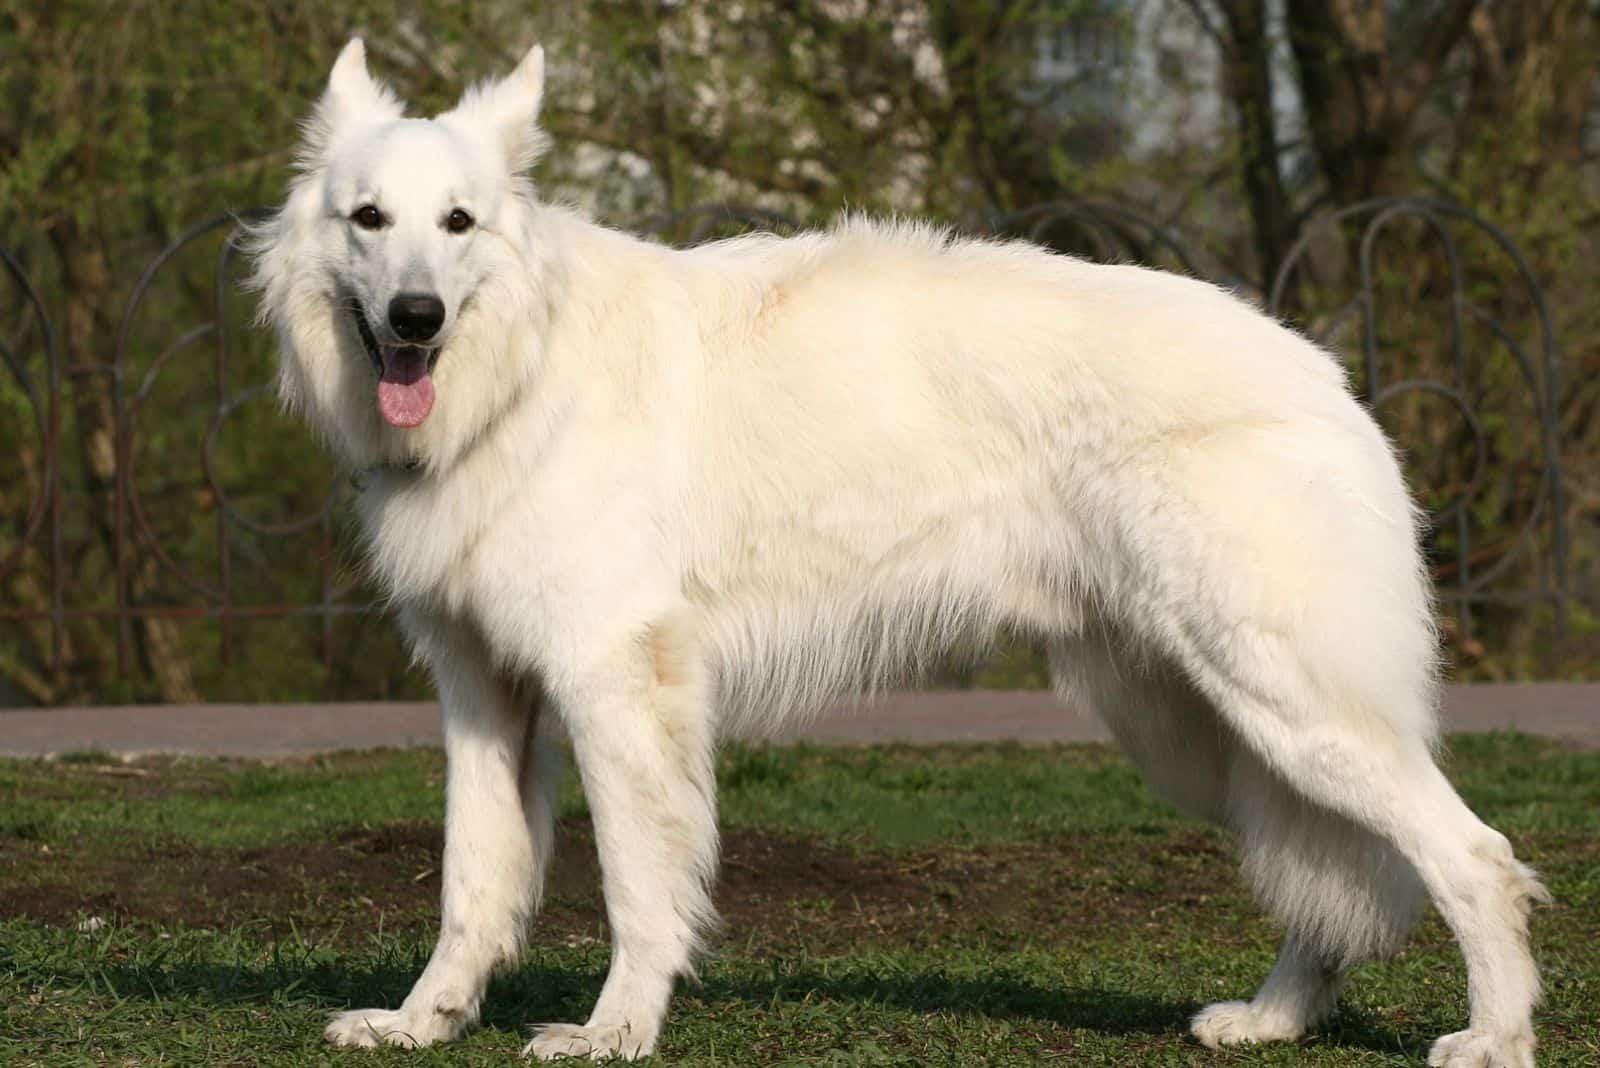 white shepherd standing in stance